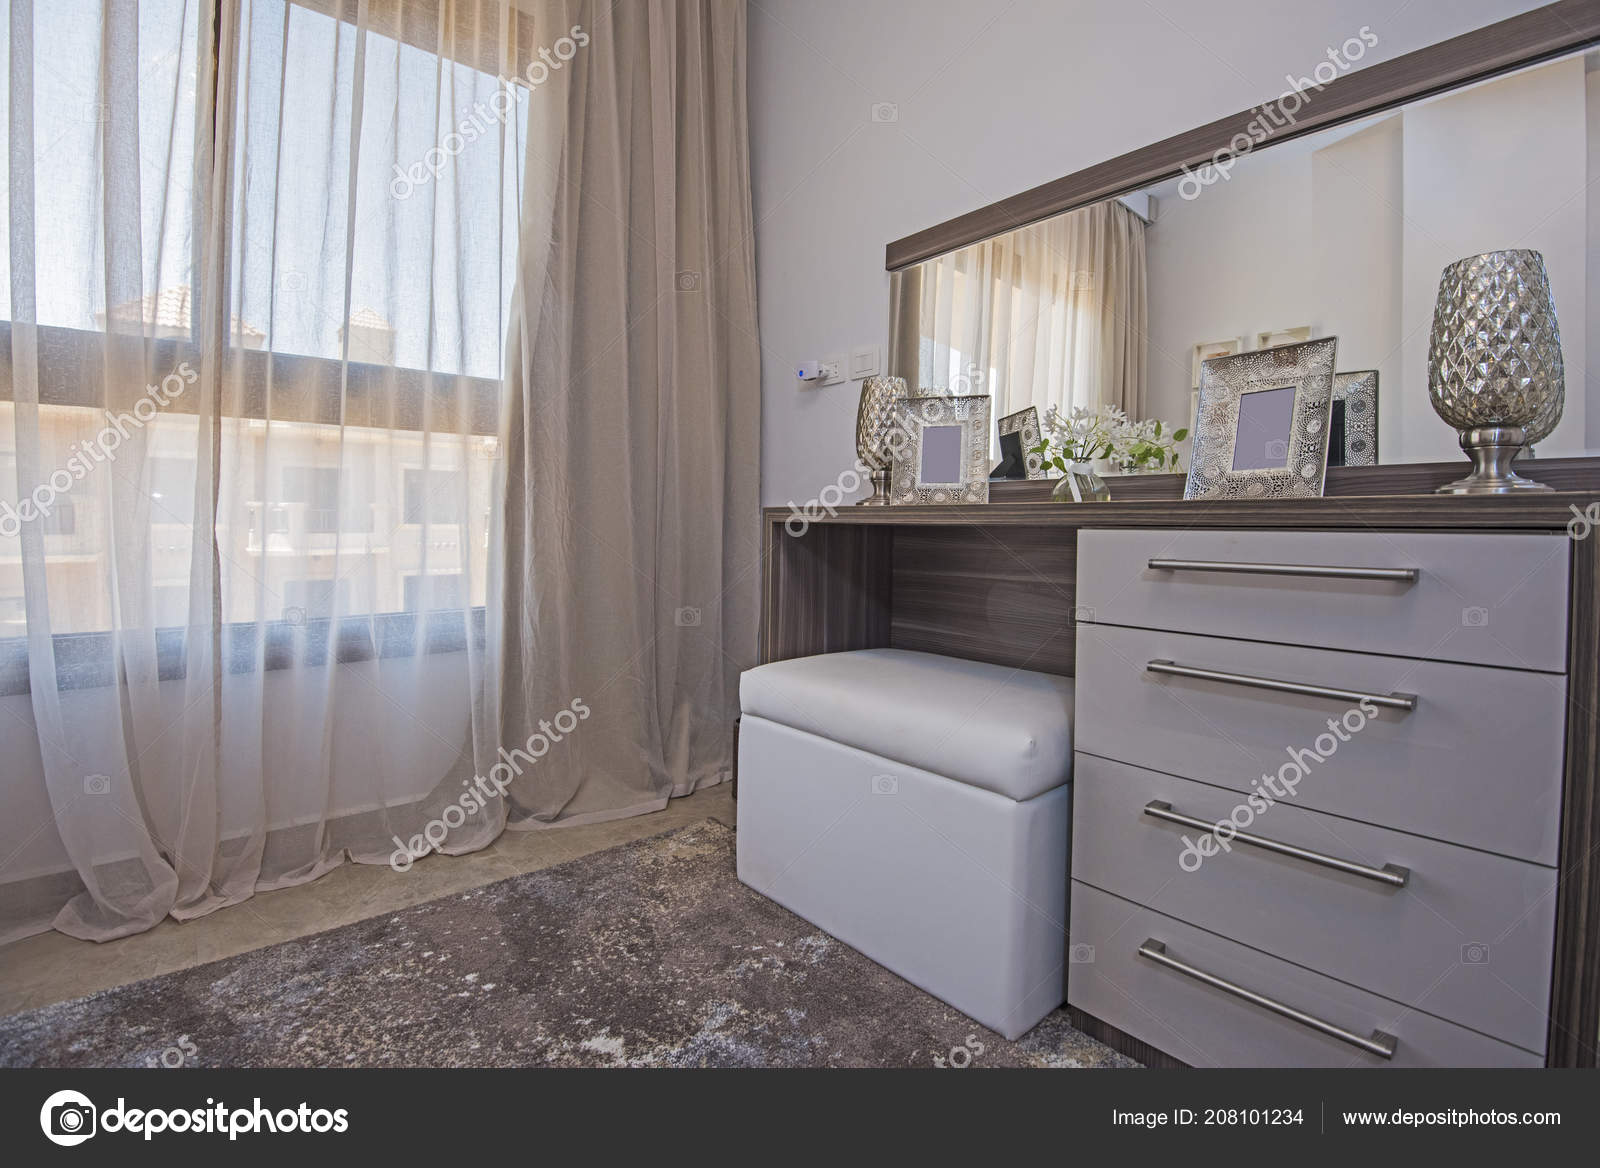 Pictures Show Home Interiors Interior Design Decor Furnishing Luxury Show Home Bedroom Dressing Table Stock Photo C Paulvinten 208101234